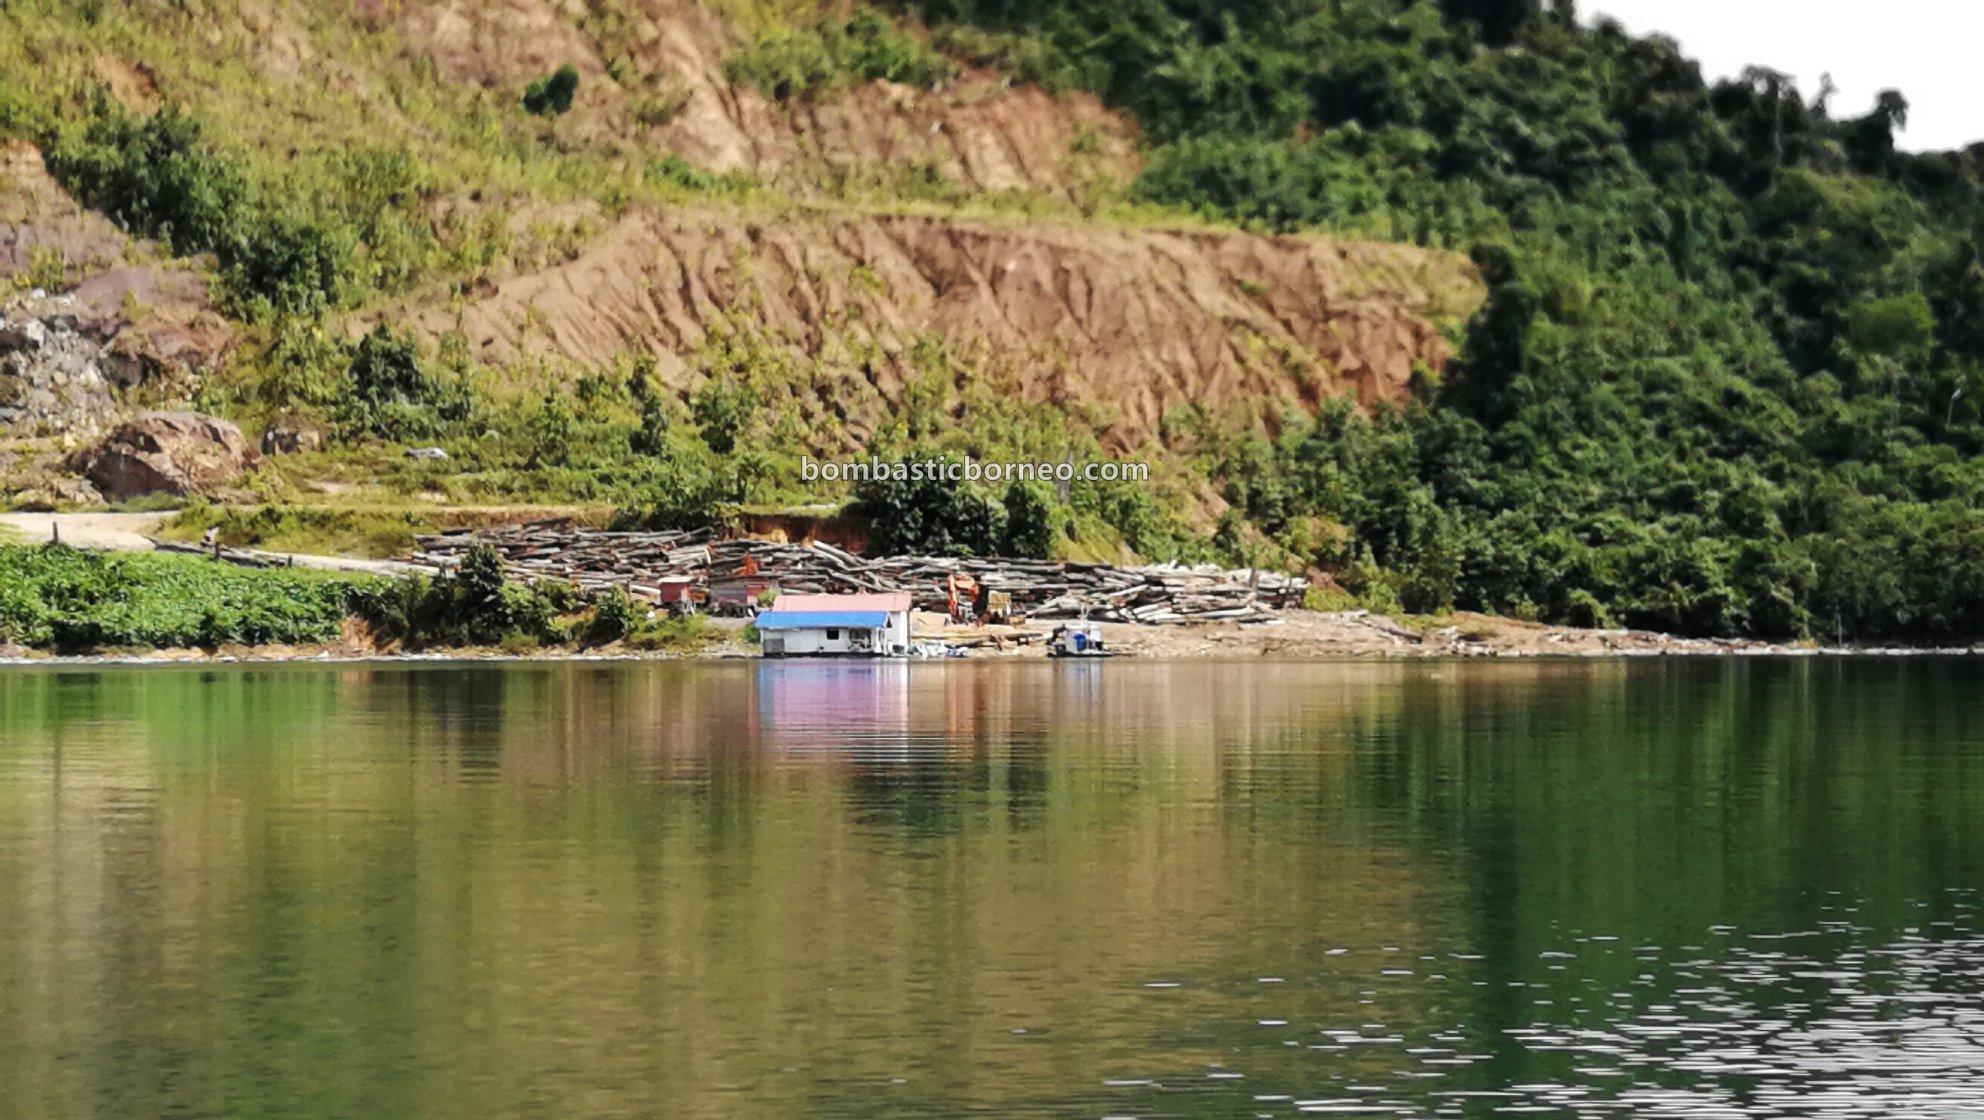 Embankment Dam, empangan, backpackers, Sungai Balui, fishing trip, memancing ikan, homestay, Tourism, tourist attraction, Borneo, 婆罗洲巴贡水电站, 砂拉越巫拉甲, 马来西亚钓鱼之旅